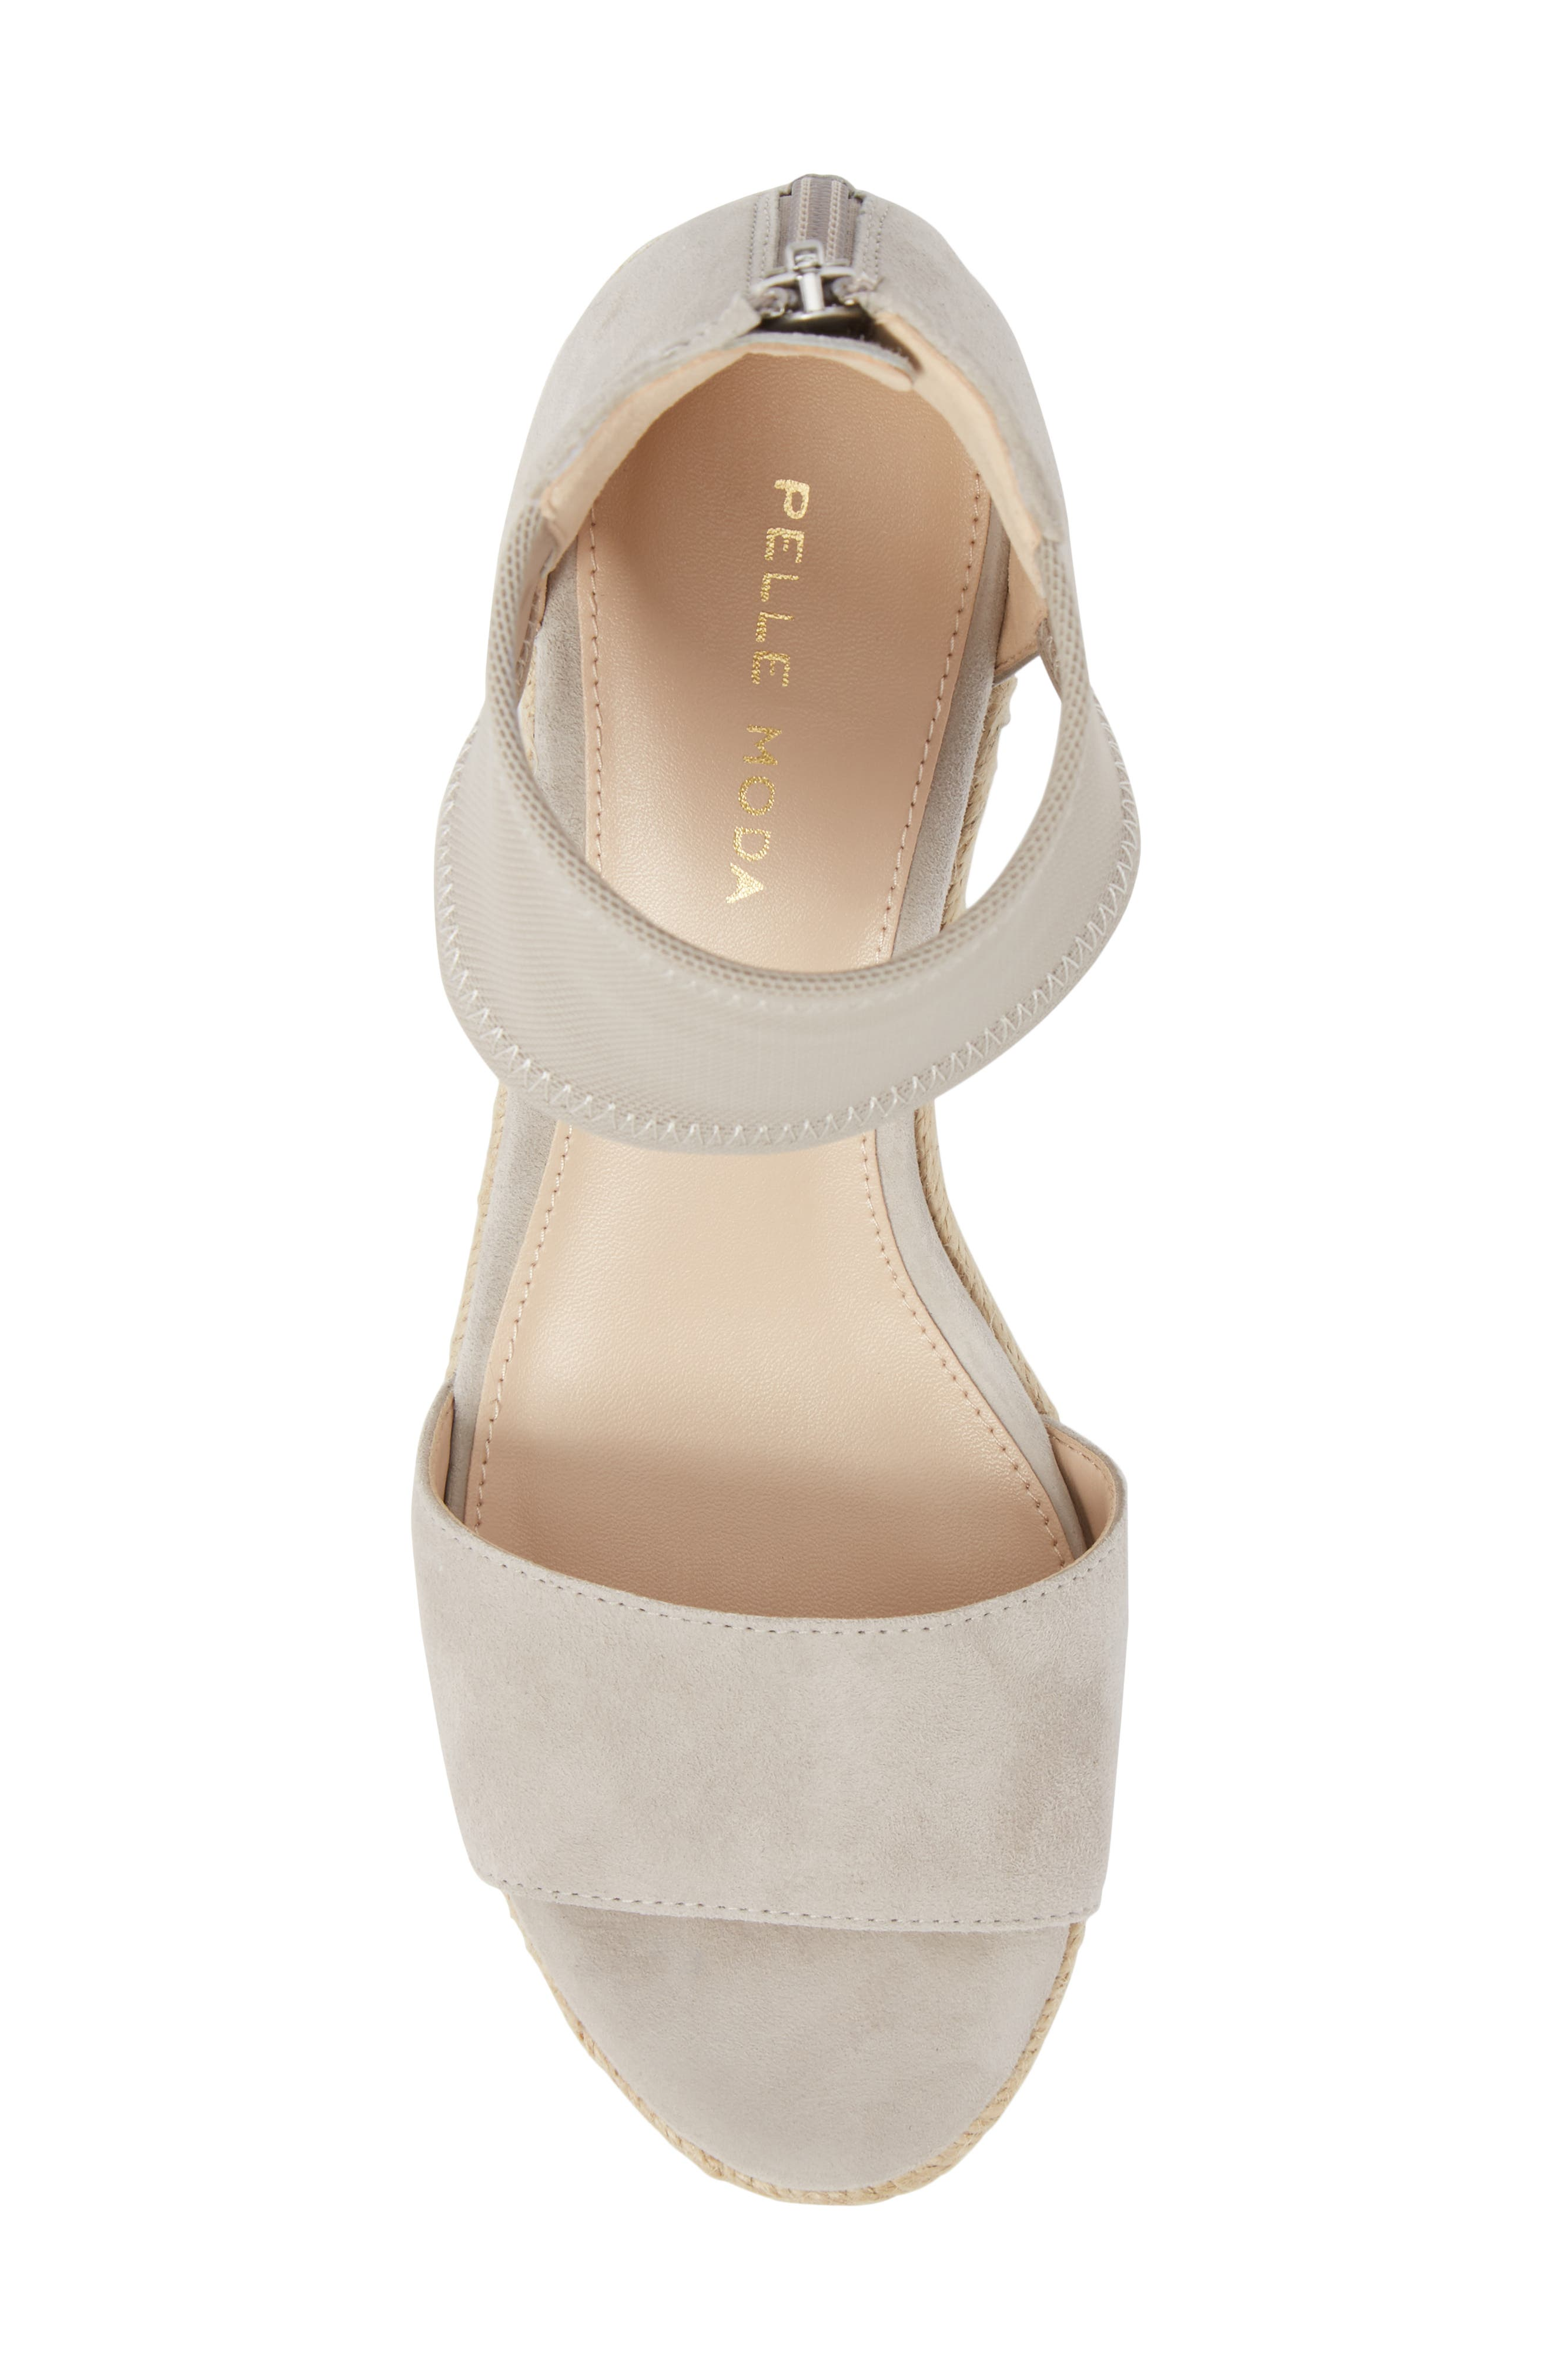 Kona Platform Wedge Sandal,                             Alternate thumbnail 5, color,                             CLOUD SUEDE